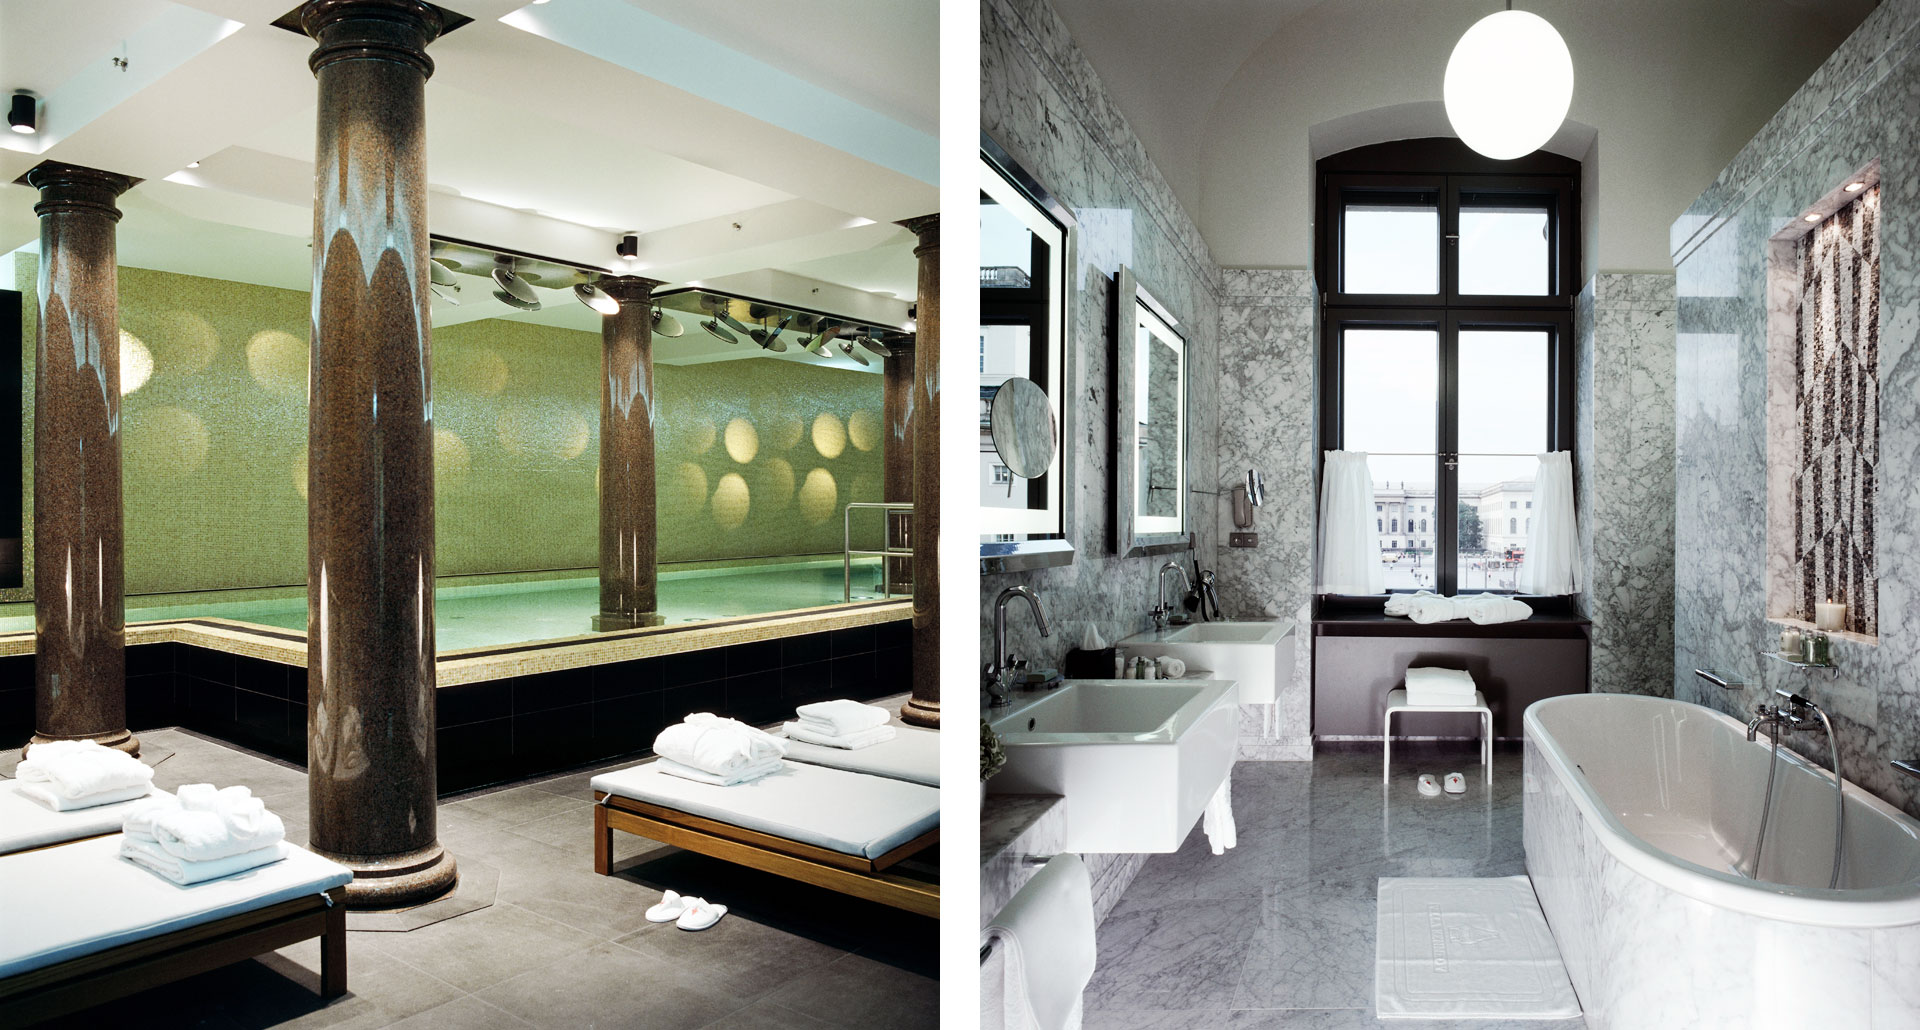 city spa hotels for business travelers staycation tablet hotels. Black Bedroom Furniture Sets. Home Design Ideas